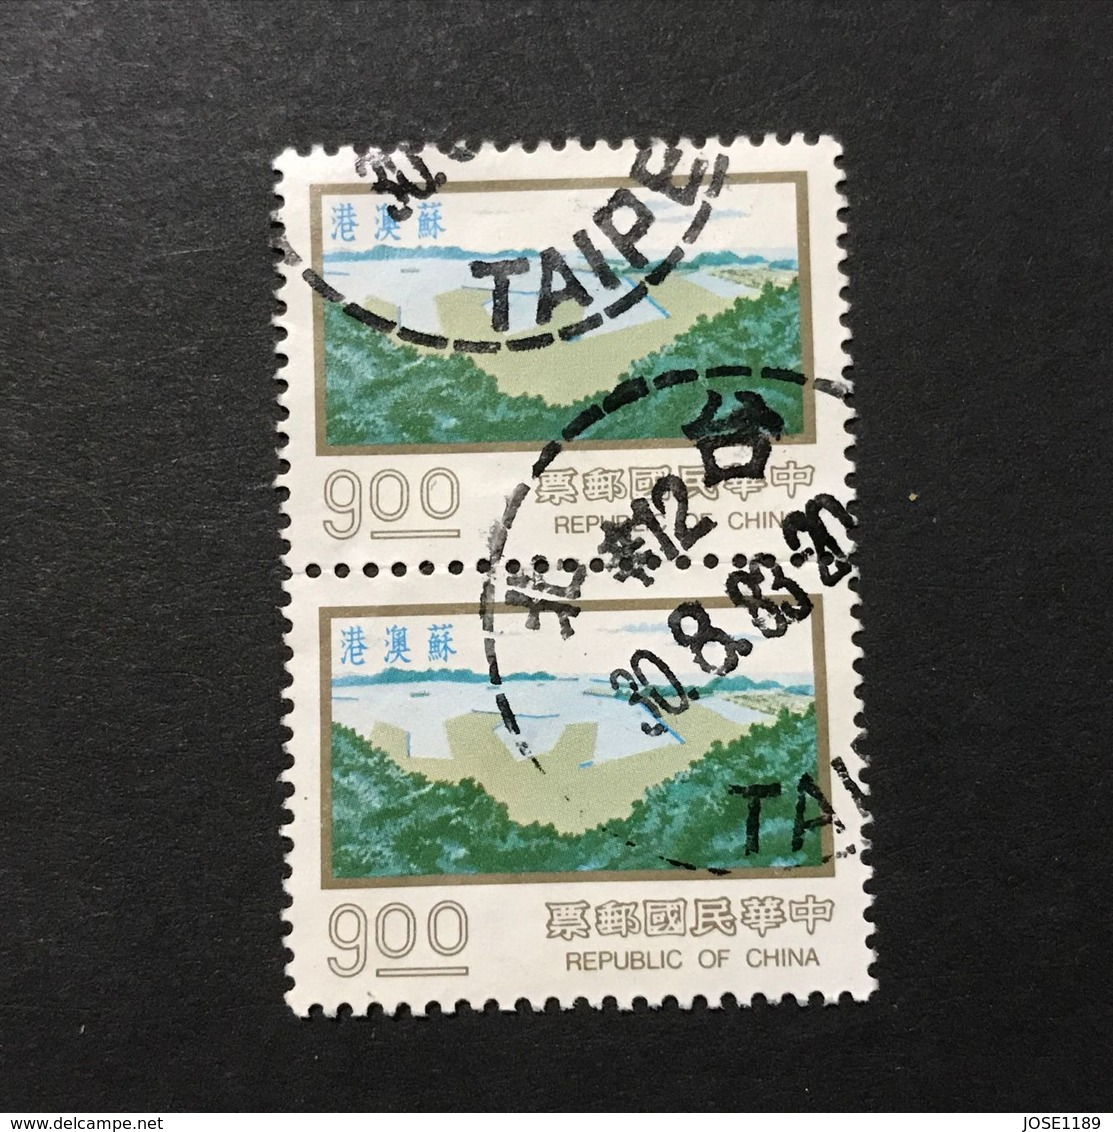 ◆◆◆Taiwán (Formosa)  1977  Designs As 1976 Issue.   $9 X2   USED   AA2327 - 1945-... República De China